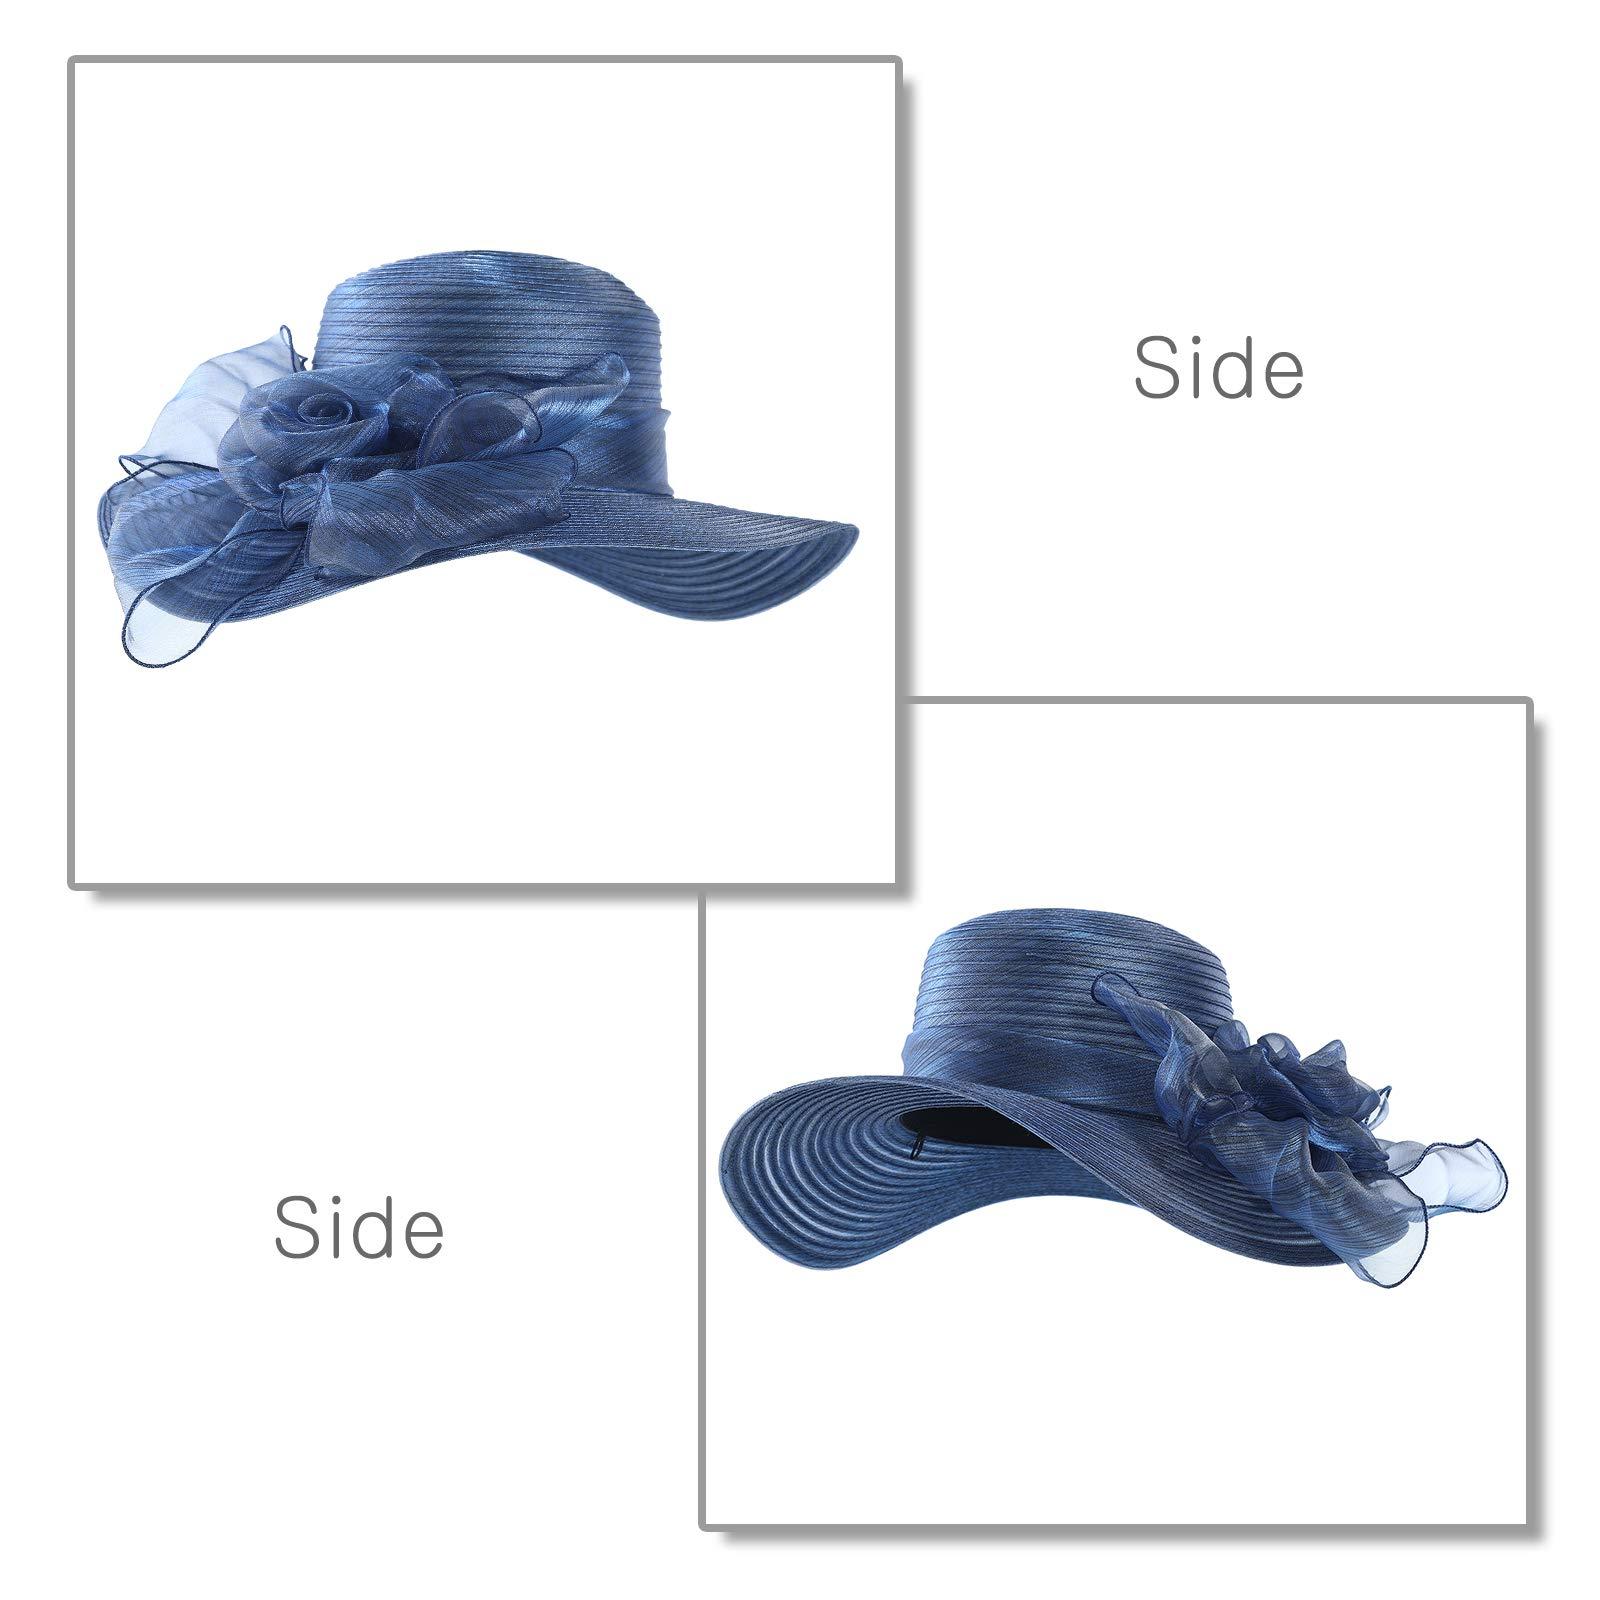 WELROG Women's Derby Church Dress Hat - Wide Brim Floppy Floral Ribbon UPF Protection Wedding Sun Hats(Navy Blue) by WELROG (Image #3)